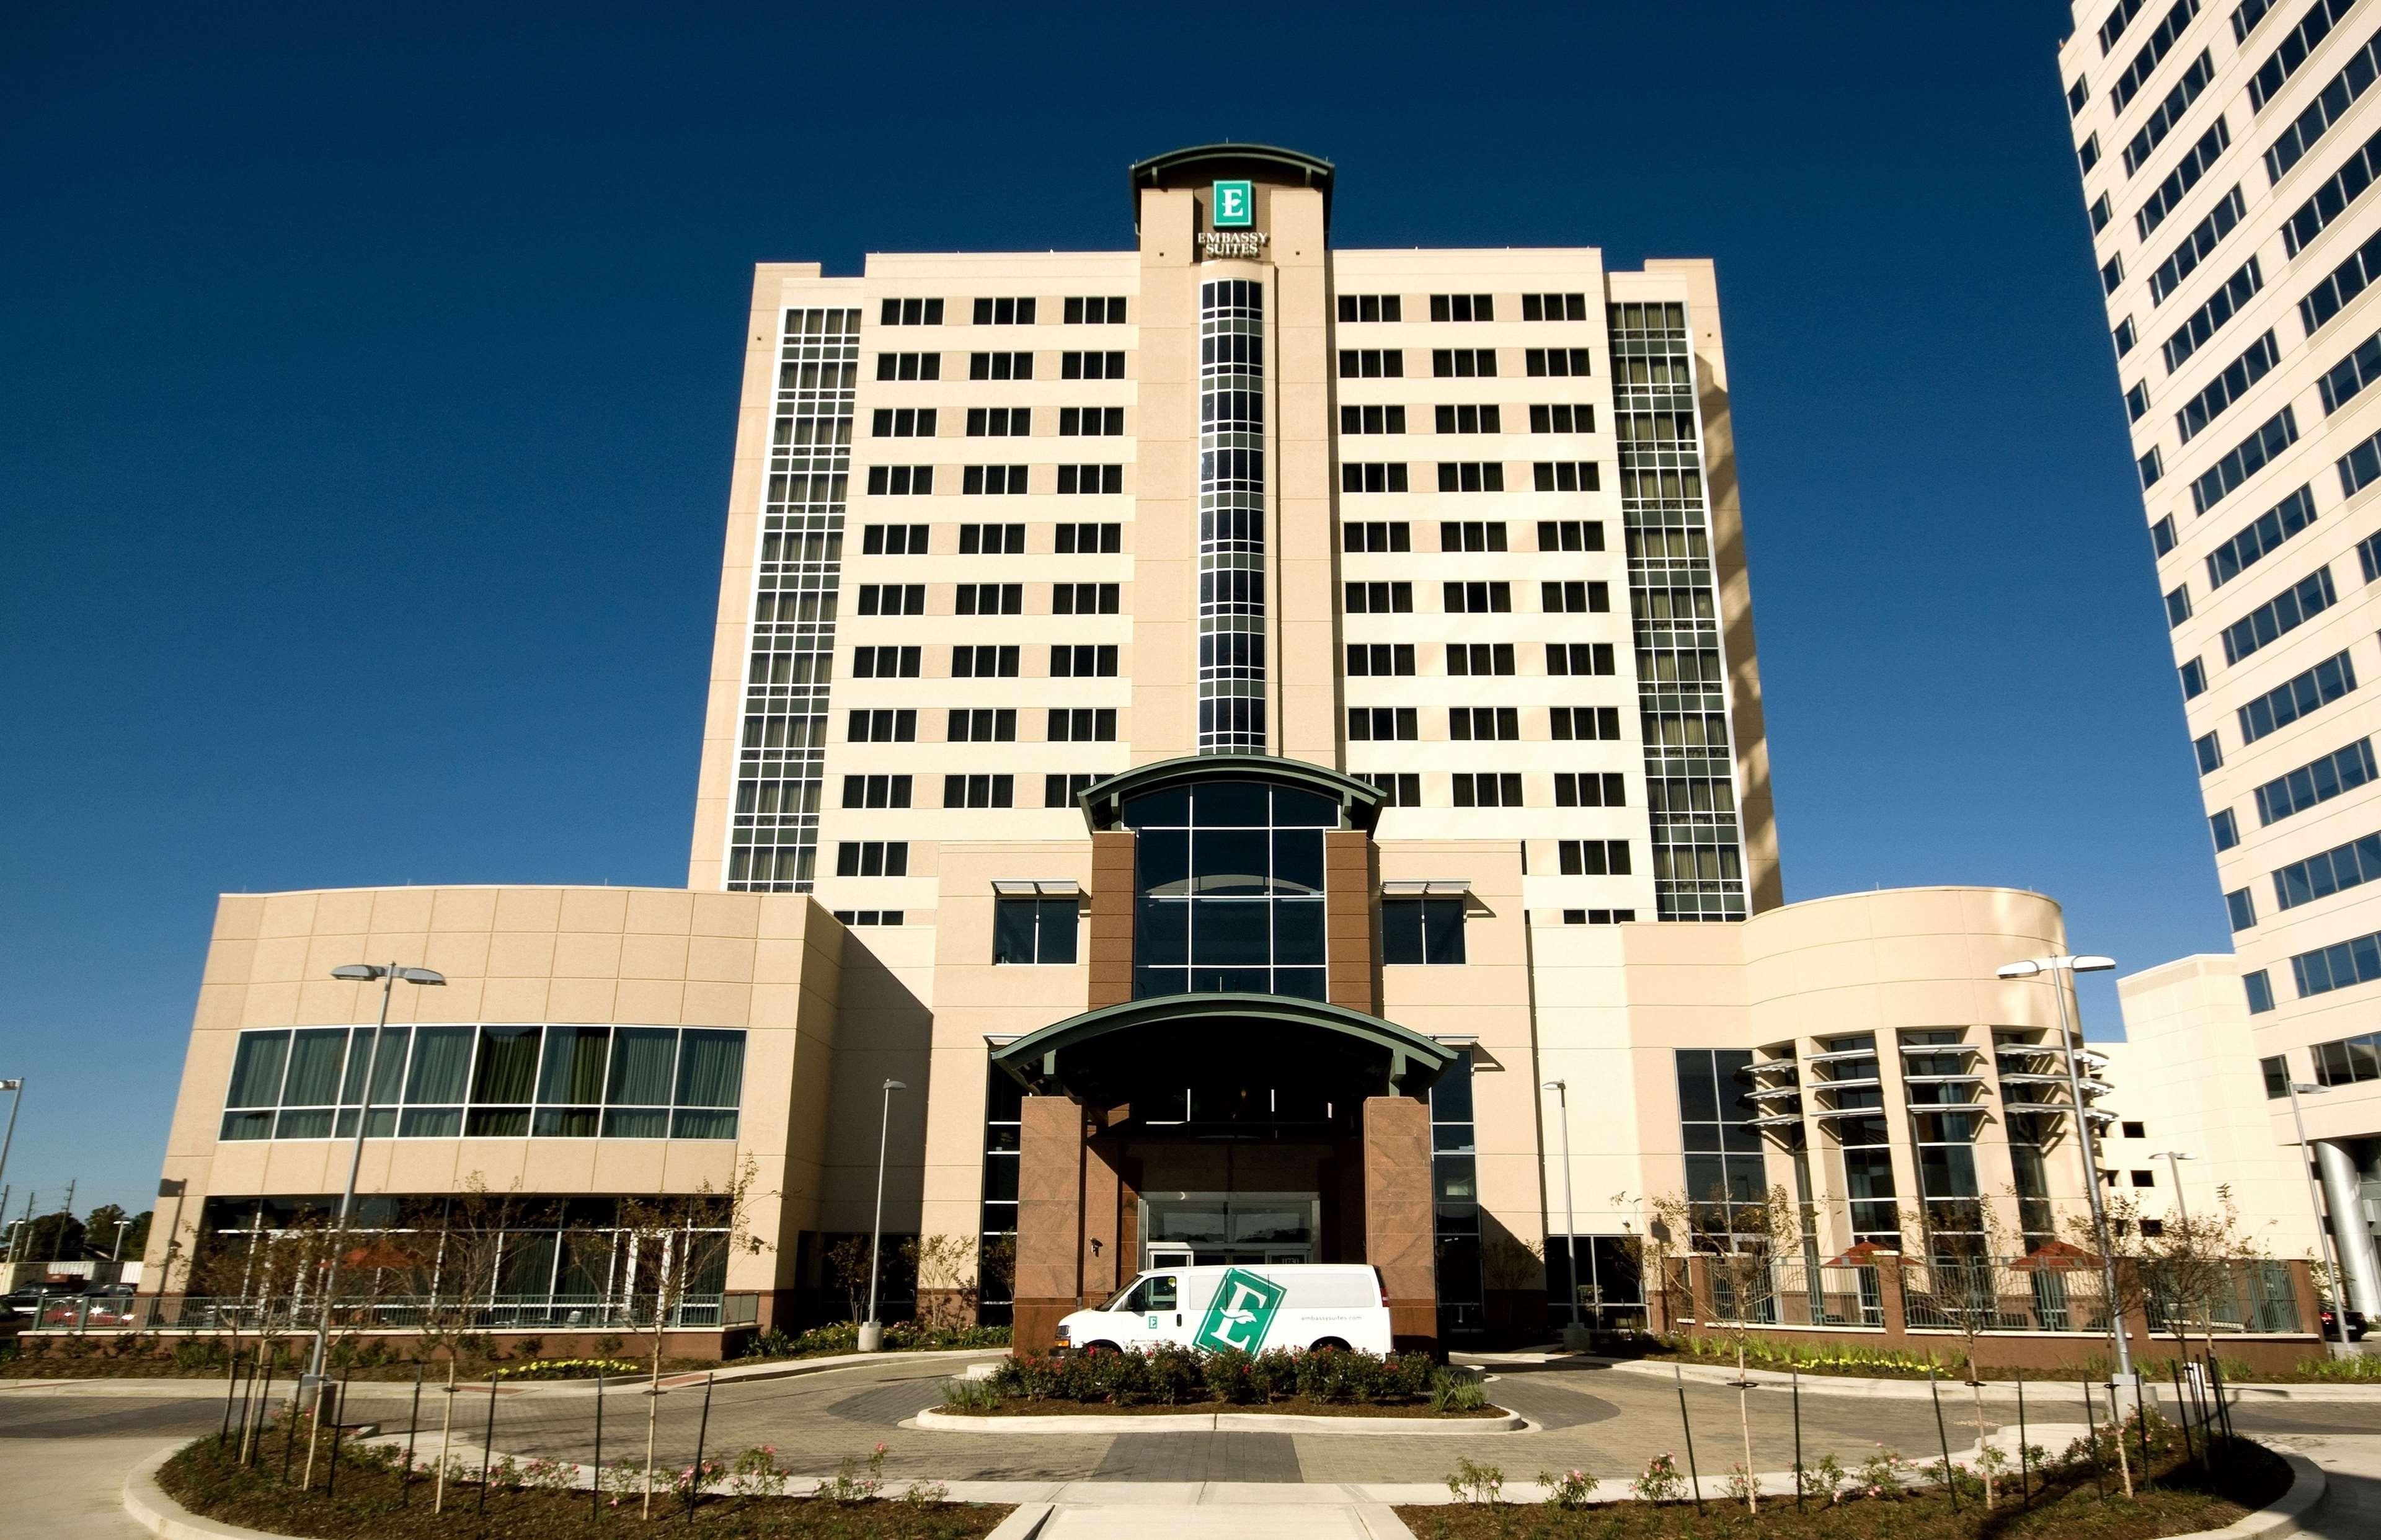 Embassy Suites by Hilton Houston Energy Corridor image 2